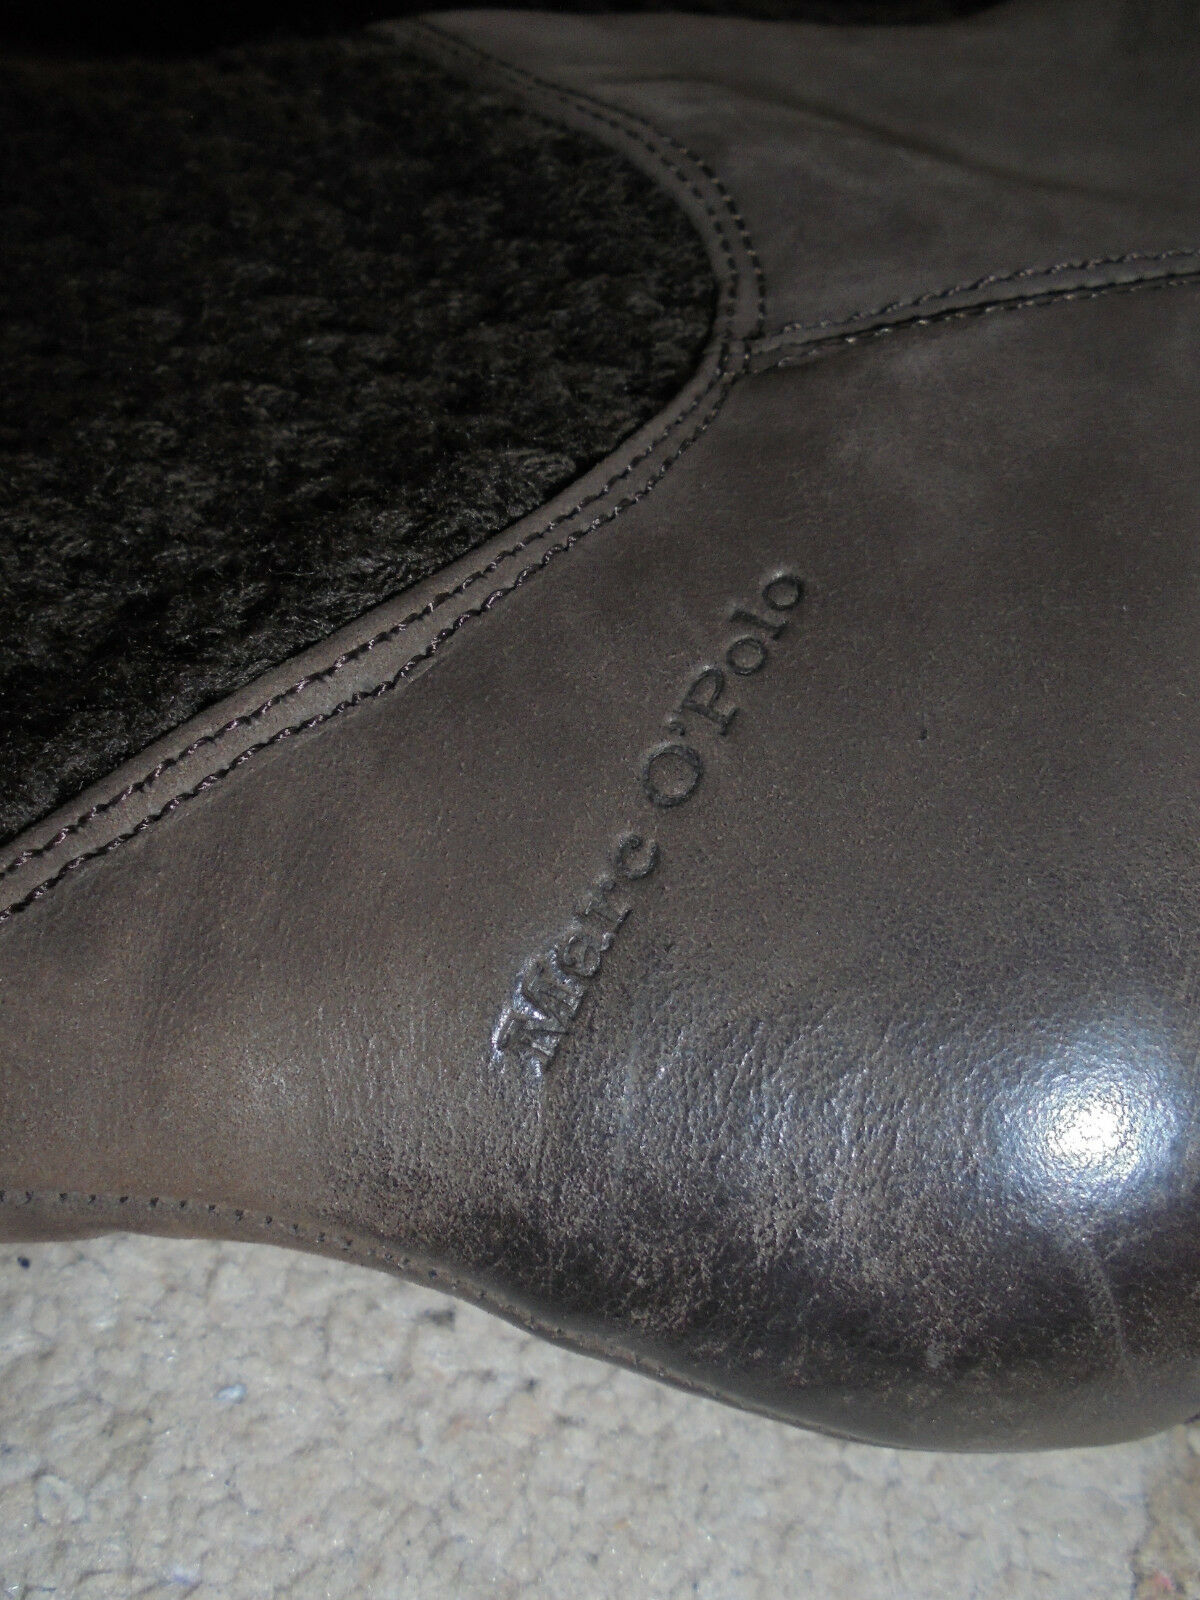 Marc o Polo MOP Damen Stiefel Boots Freizeit NP Nubuk Gr 37 38 NP Freizeit 180 Euro 2f7627